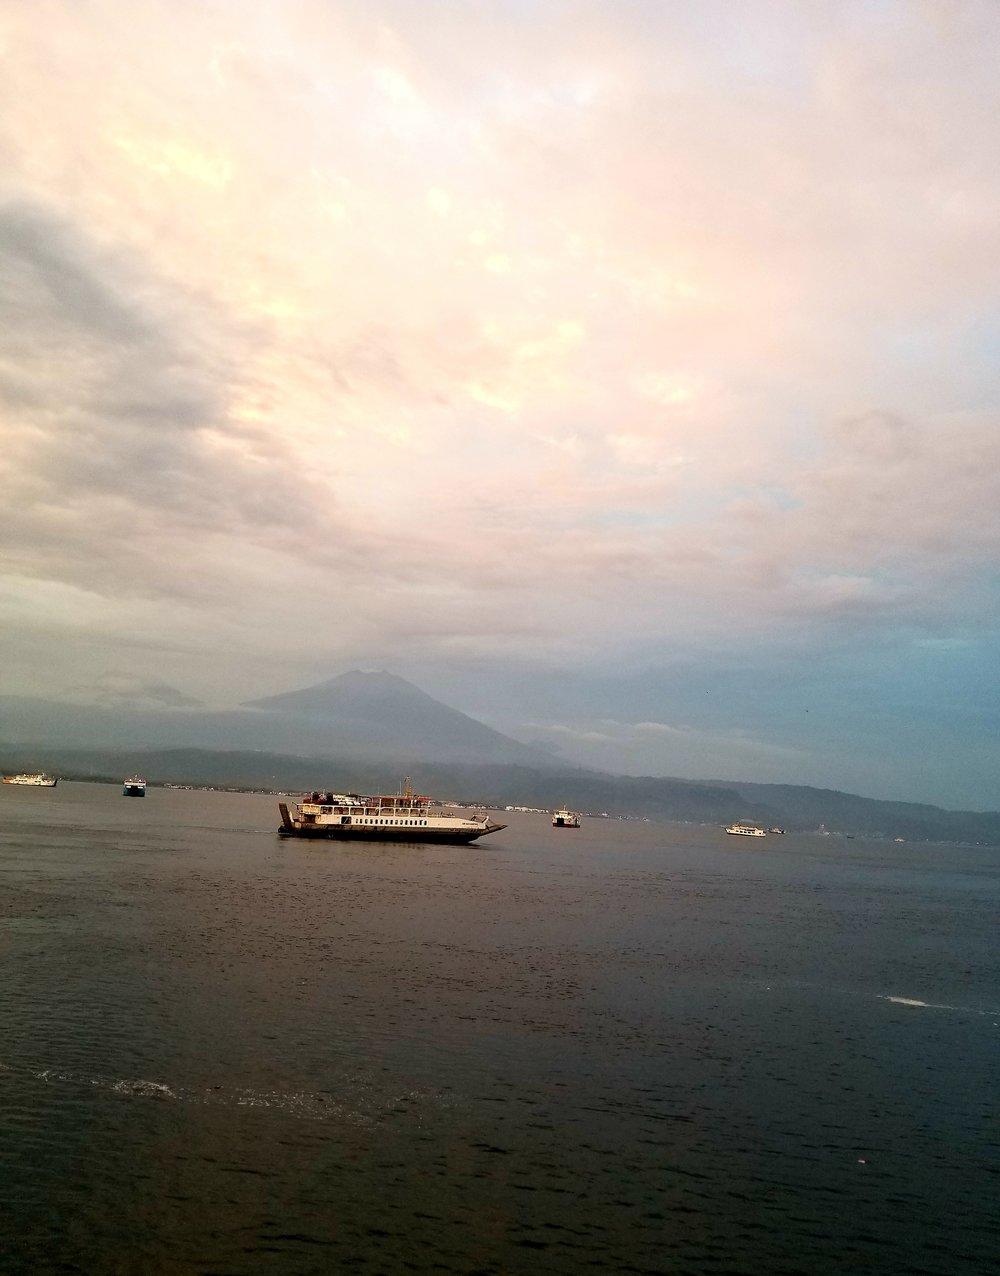 View from Bali's Gilimanuk Ferry. Photo Courtesy J.Thurston